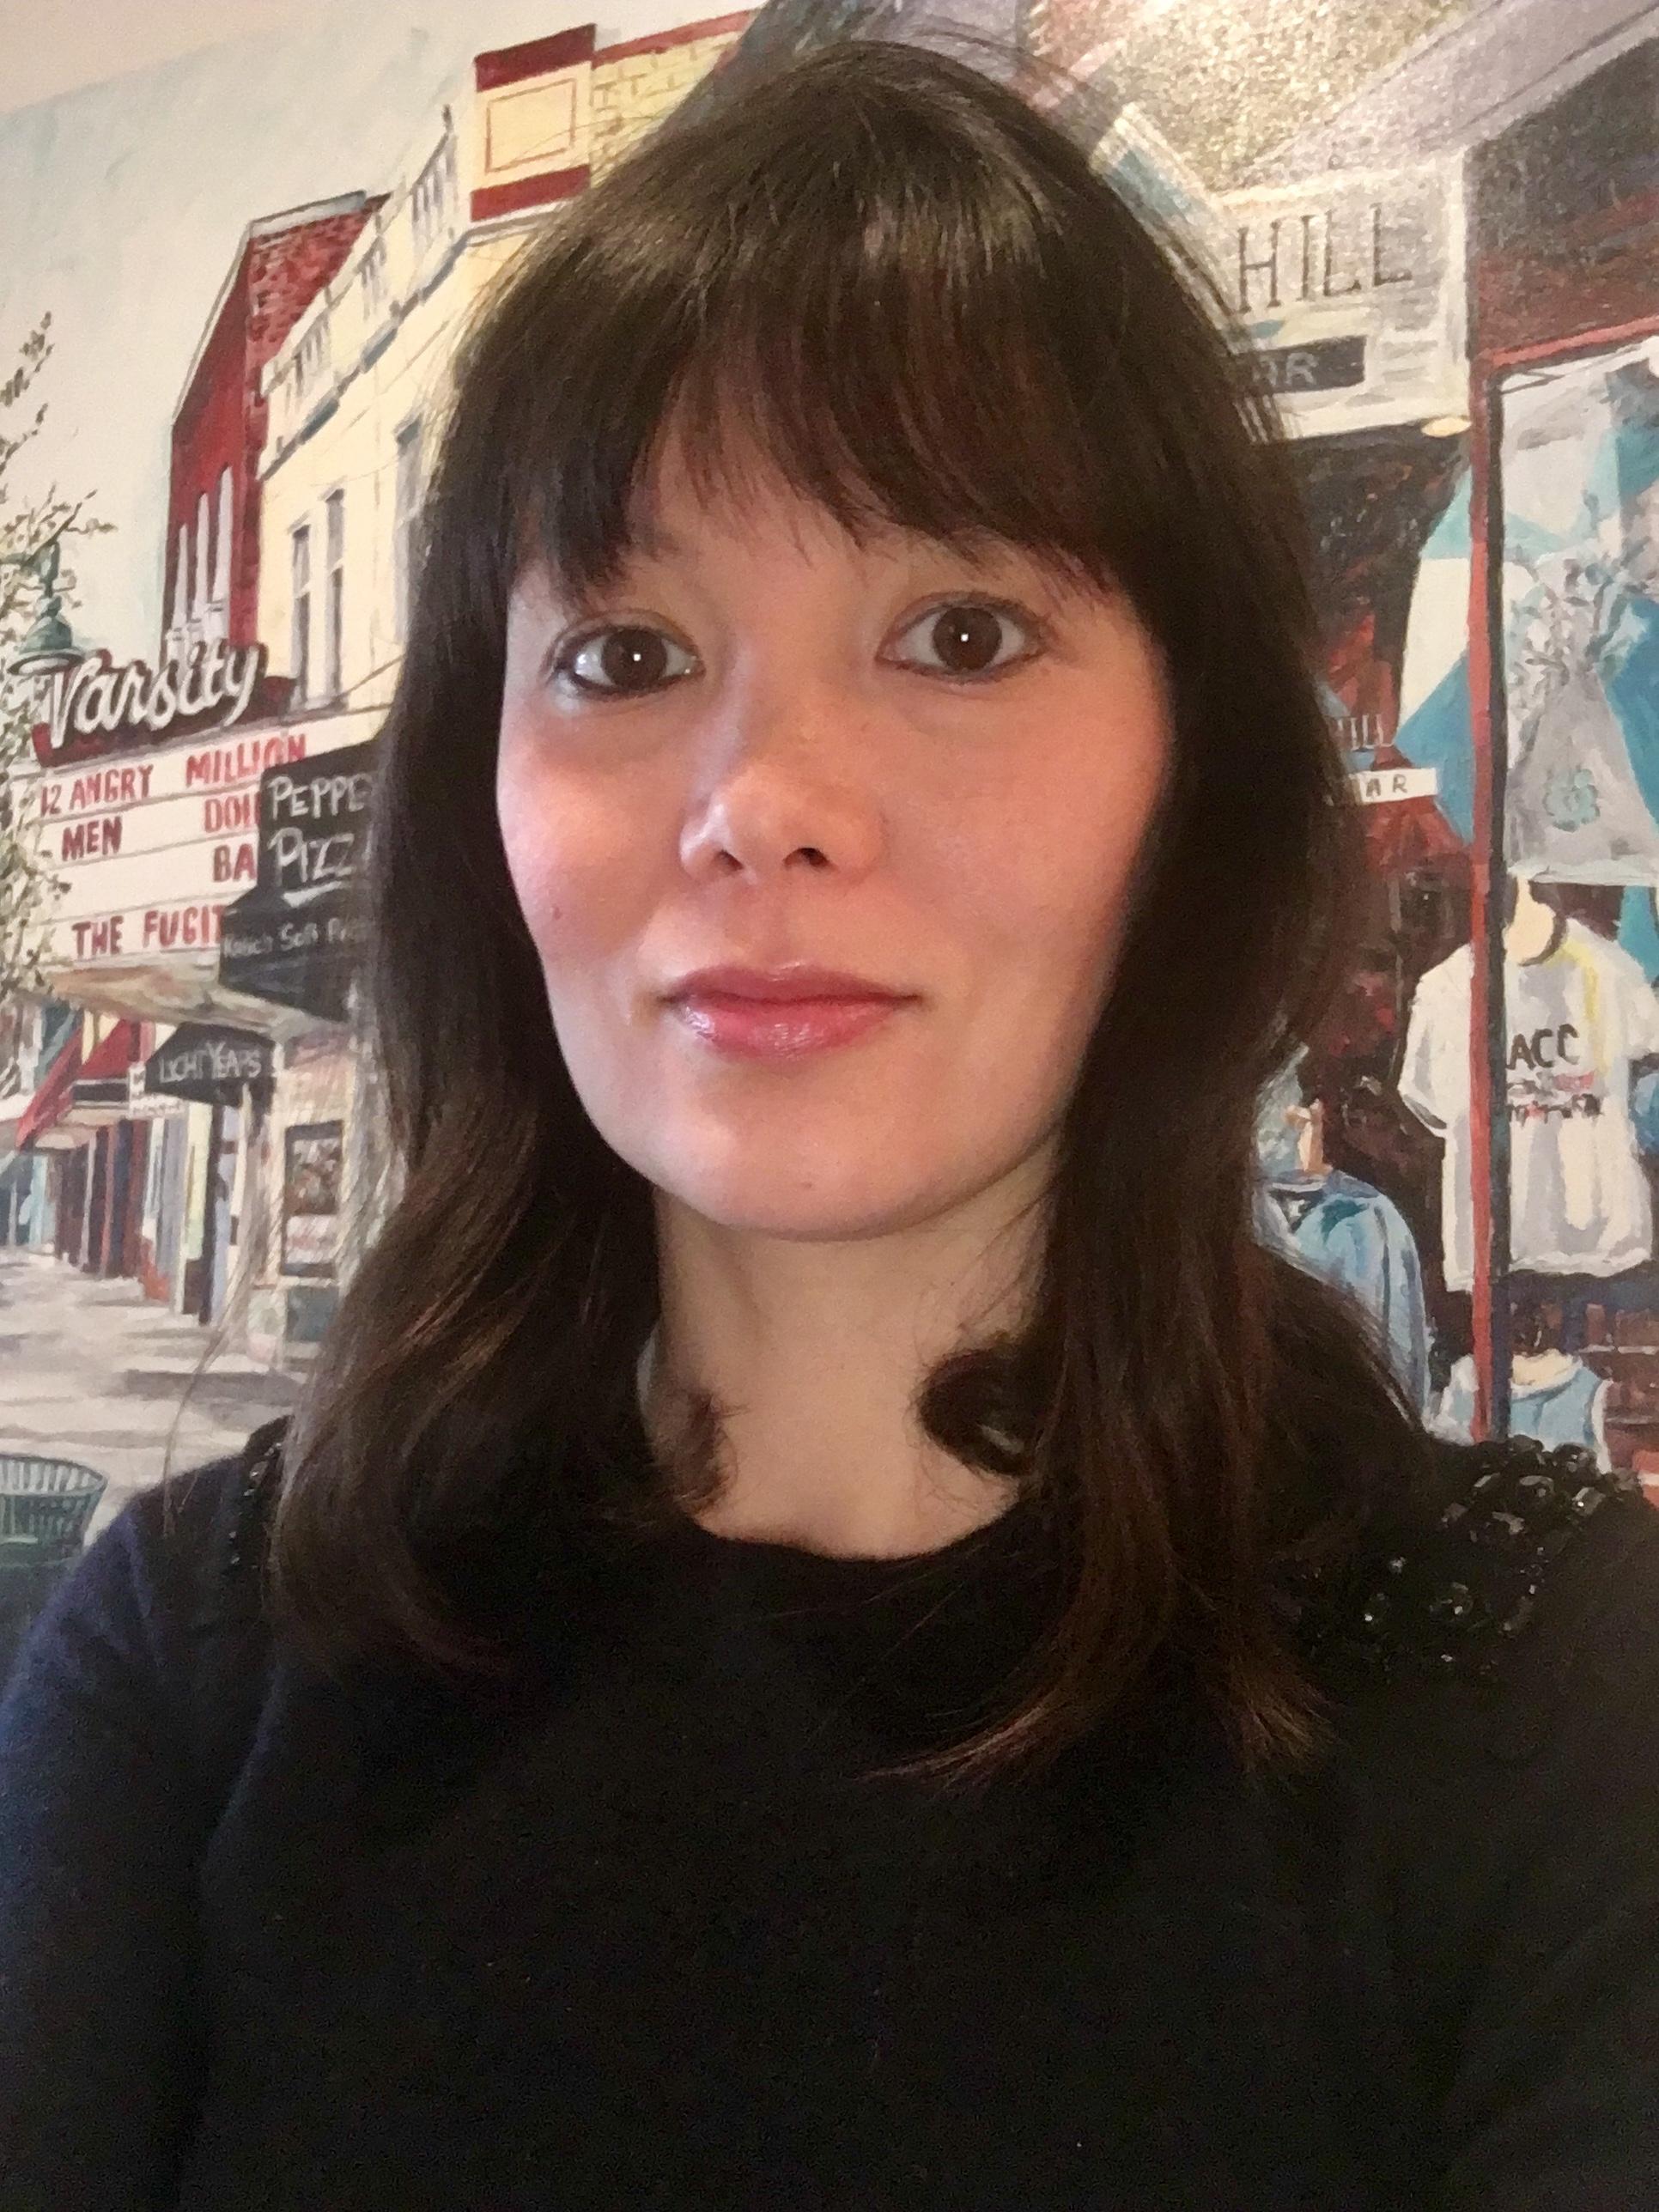 Q&A: JESSICA CASE, DEPUTY PUBLISHER OF PEGASUS BOOKS